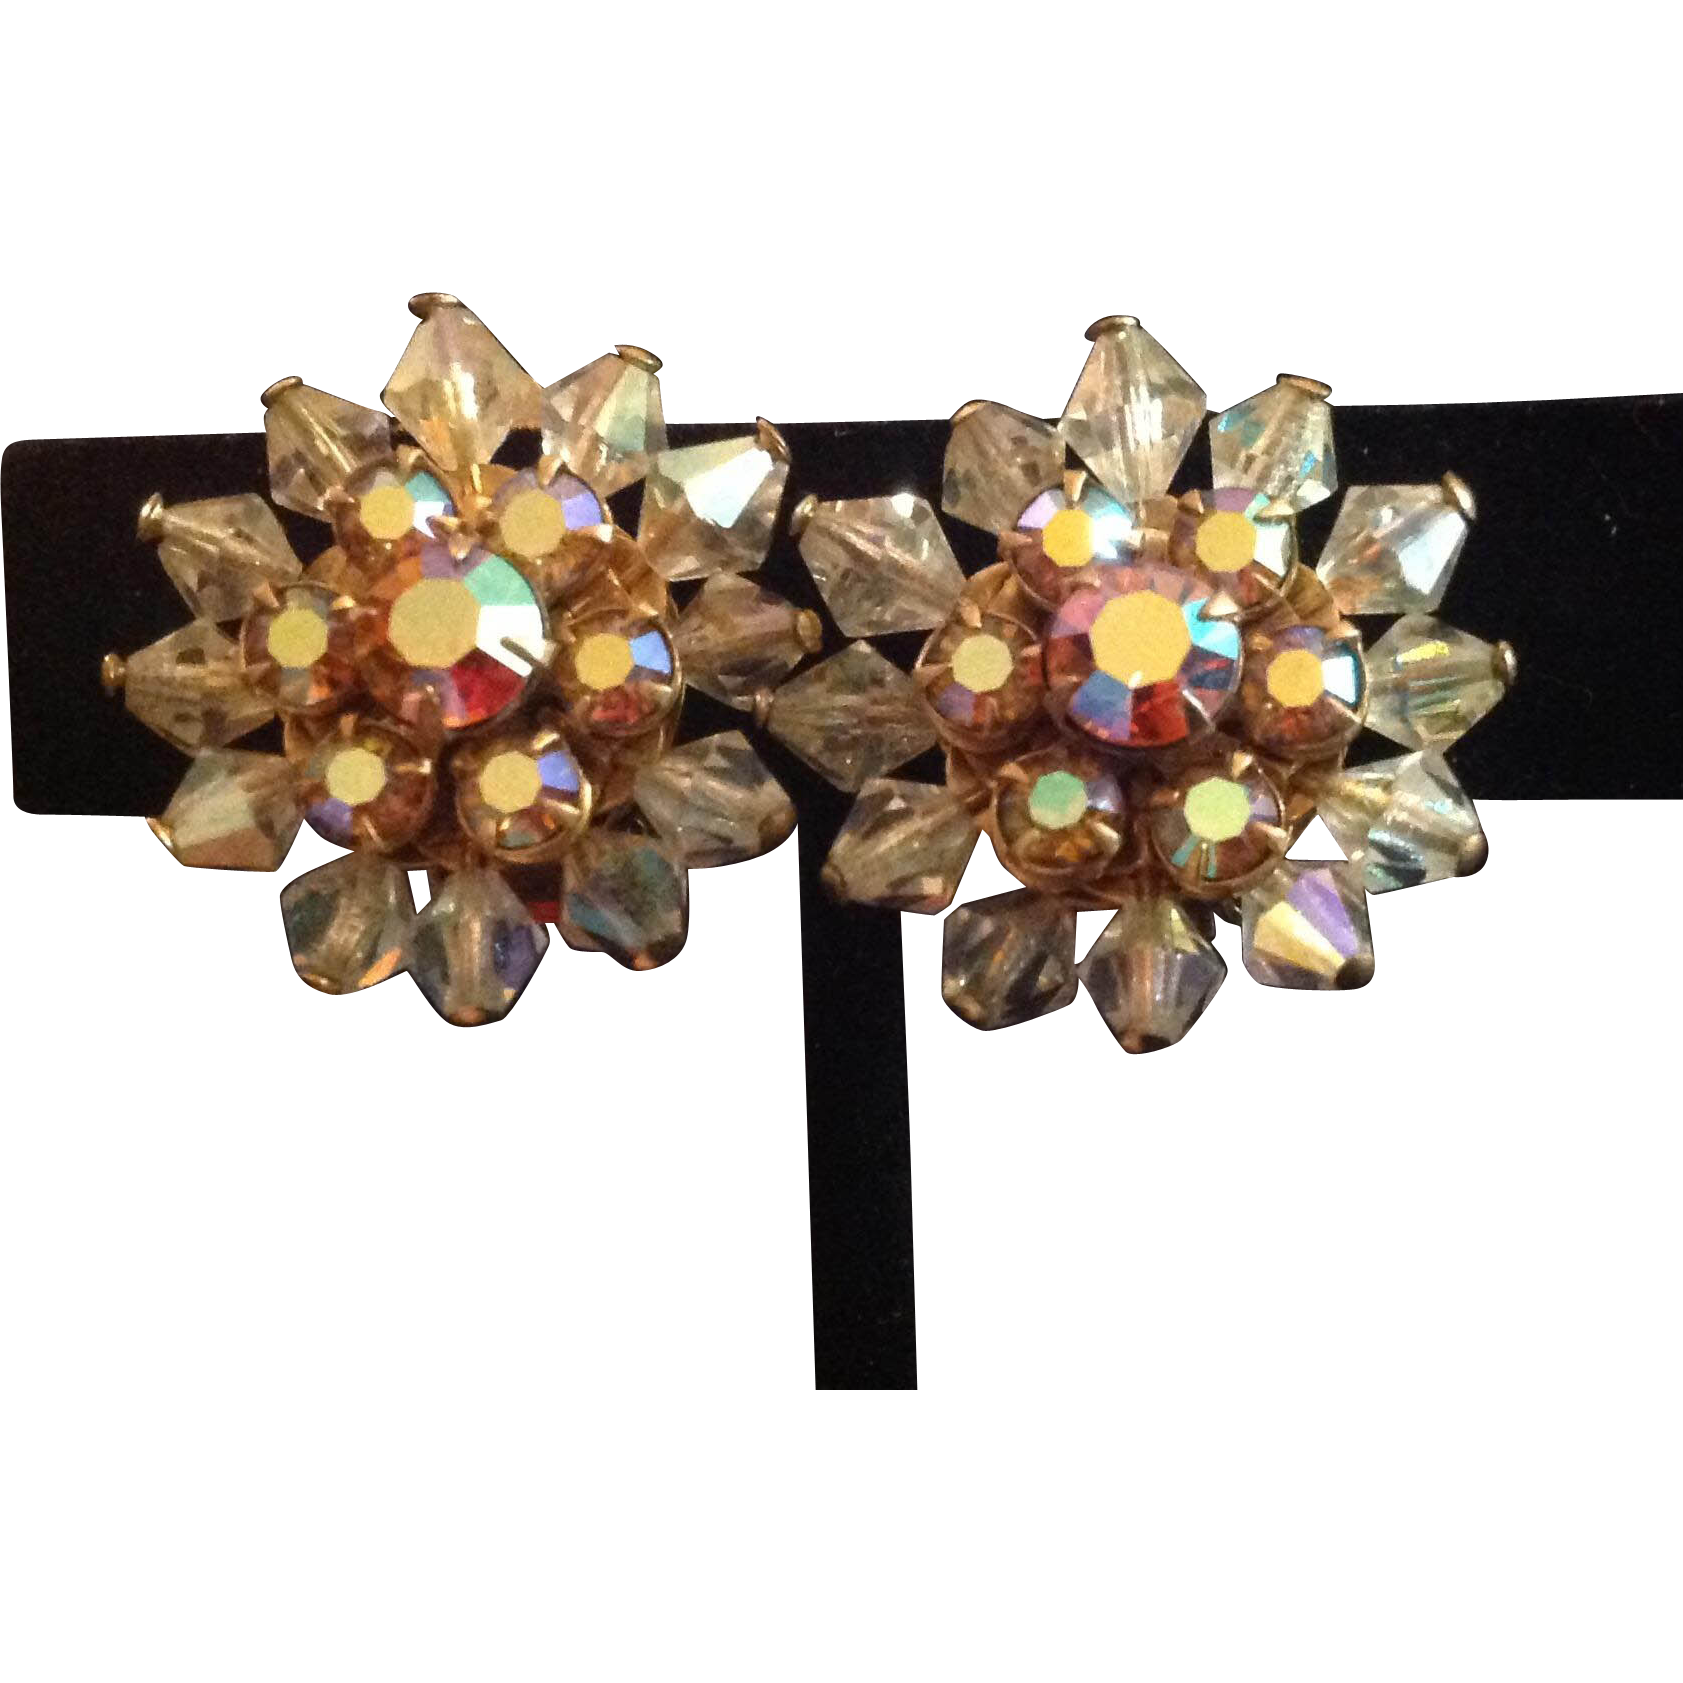 Weiss Aurora Borealis Rhinestone and Bead Cluster Earrings